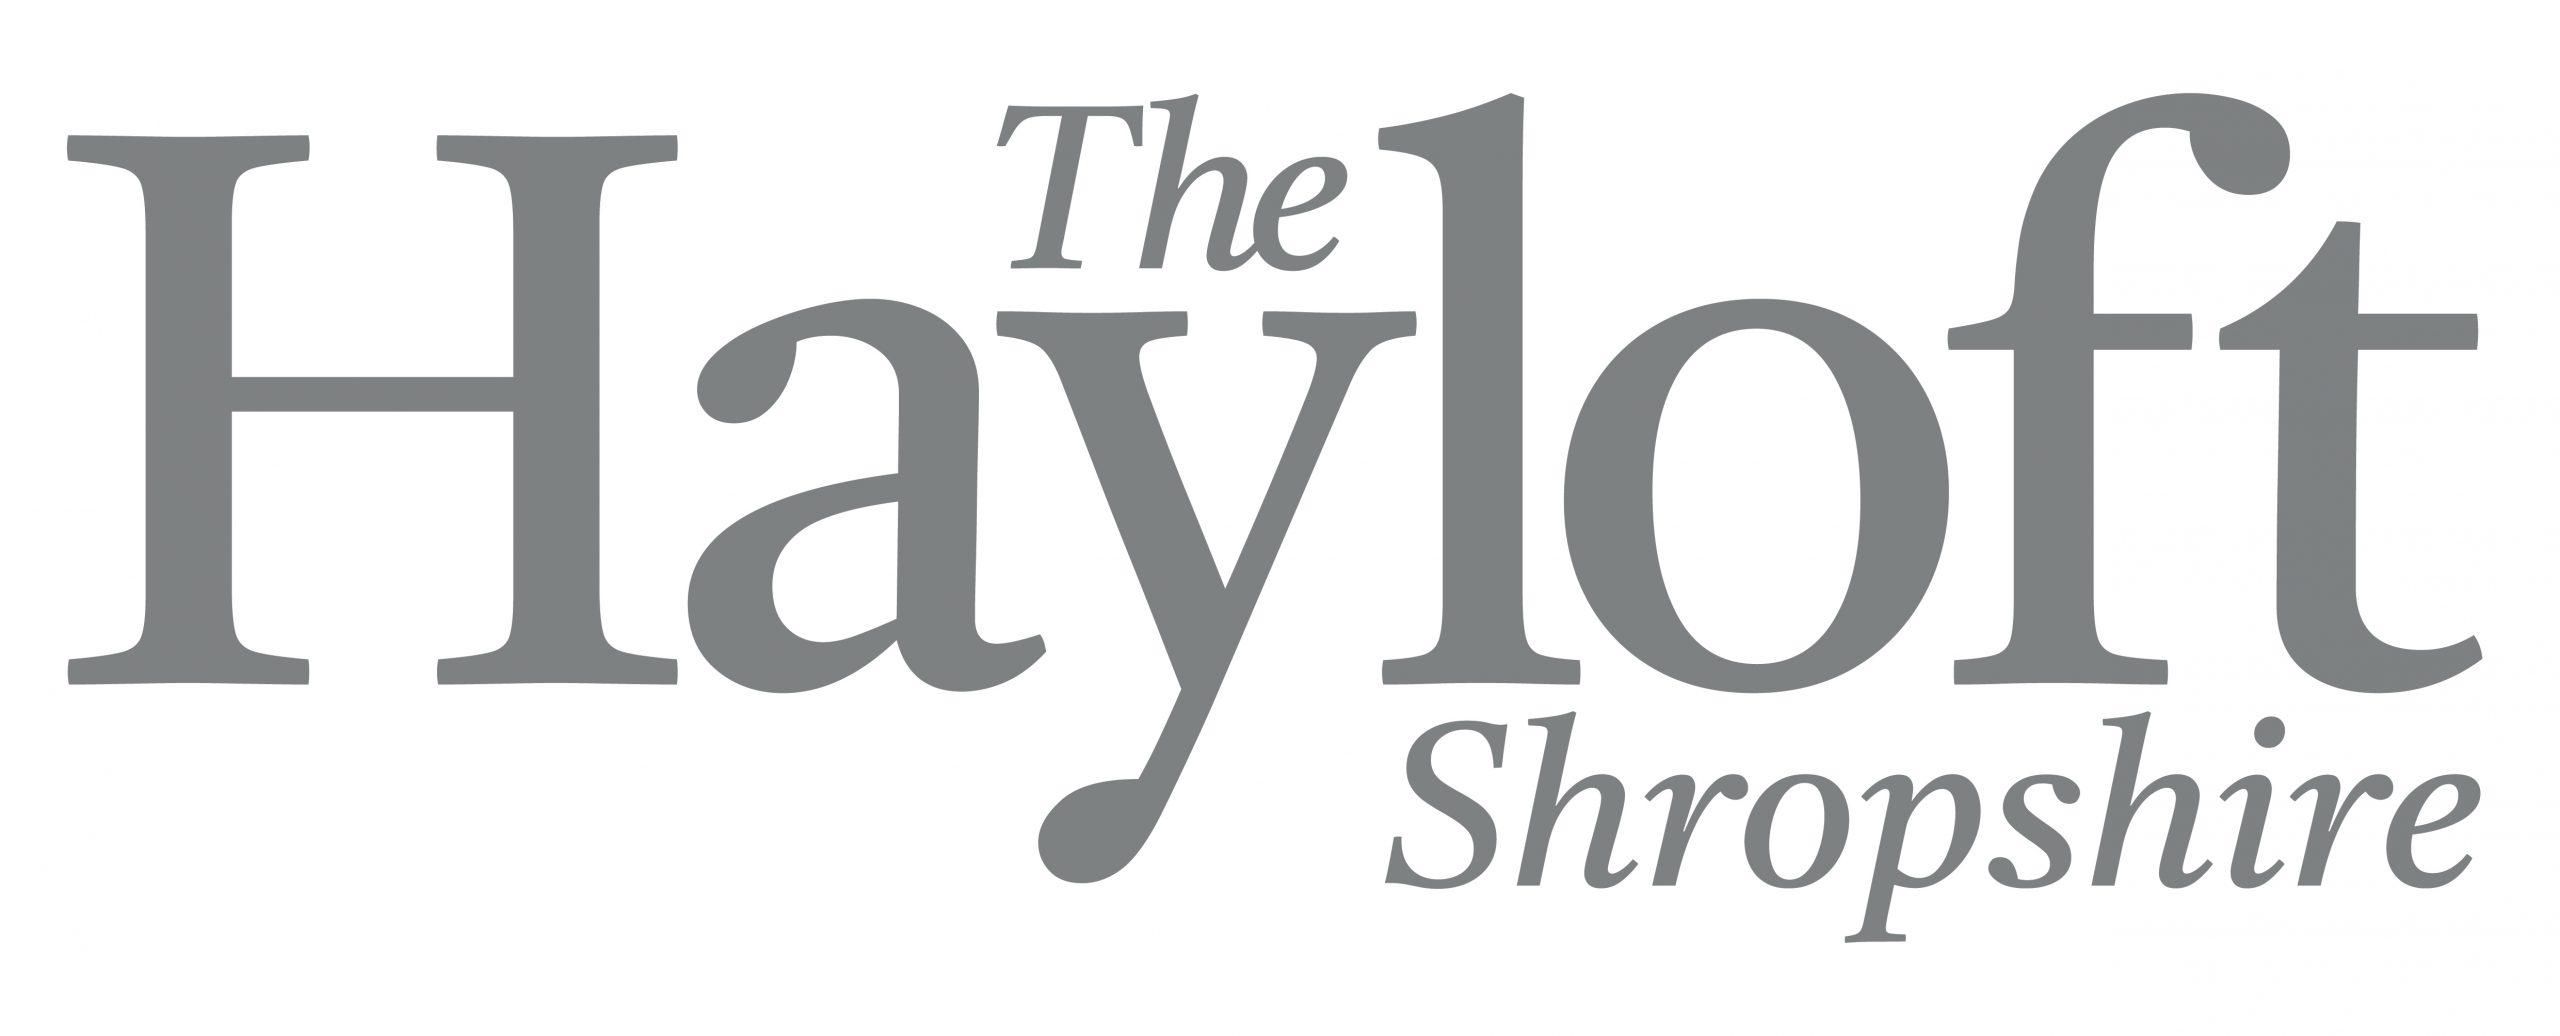 The hayloft logo